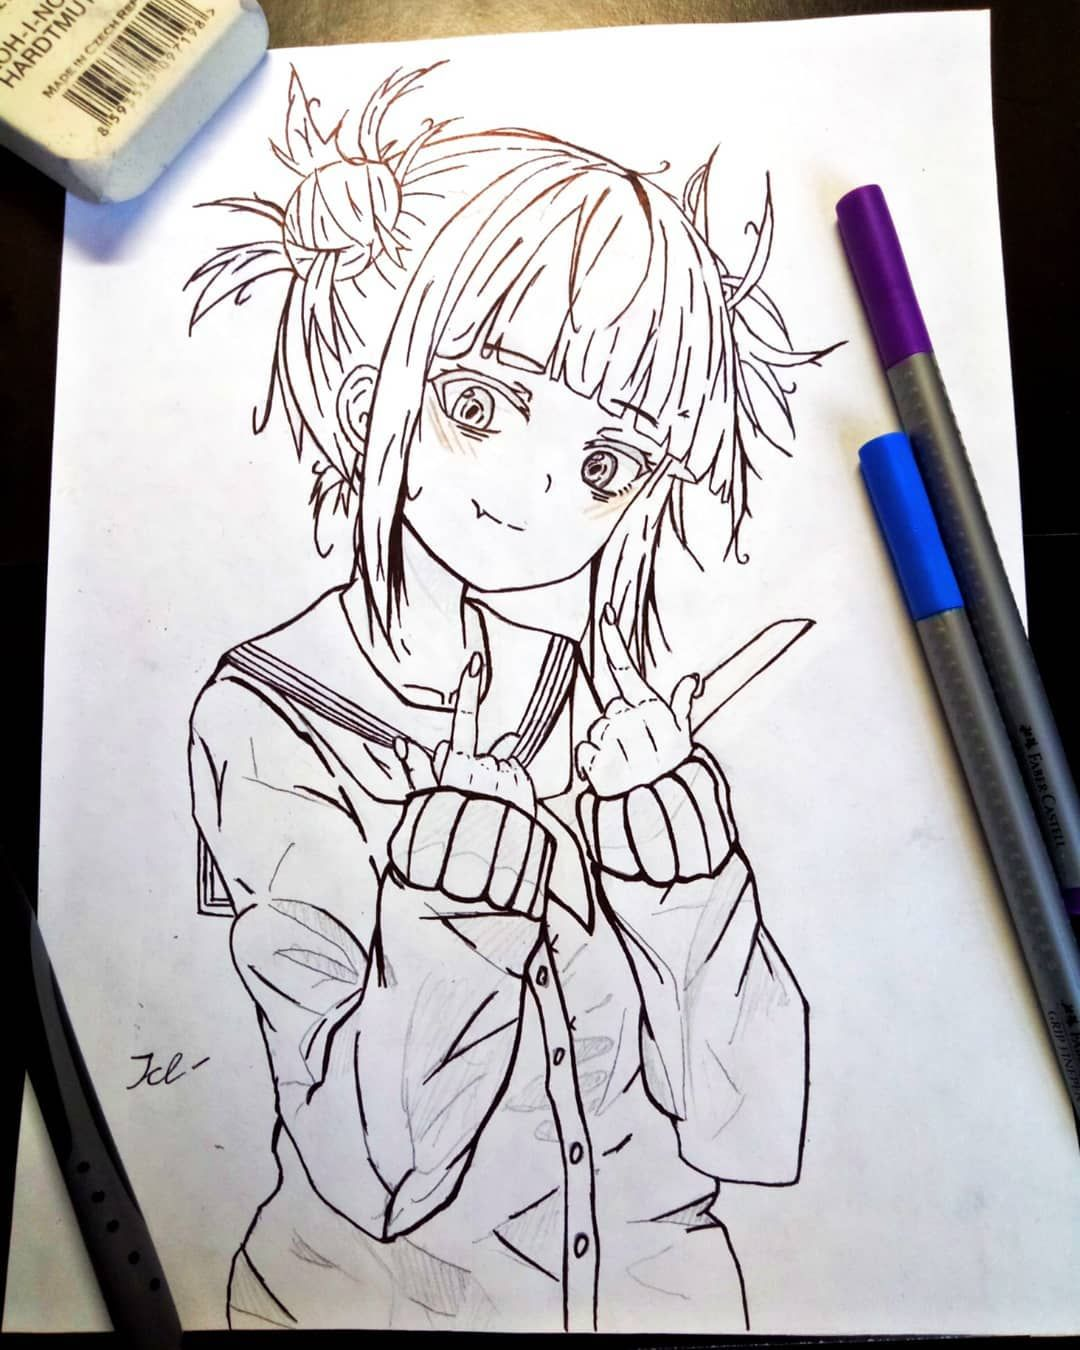 Himiko Toga My Hero Akademia Anime Art Animeart Kawaii Sketch Digitalart Traditionalart Japanesegirl Cute Bts Commissions O Anime Sketch Anime Art